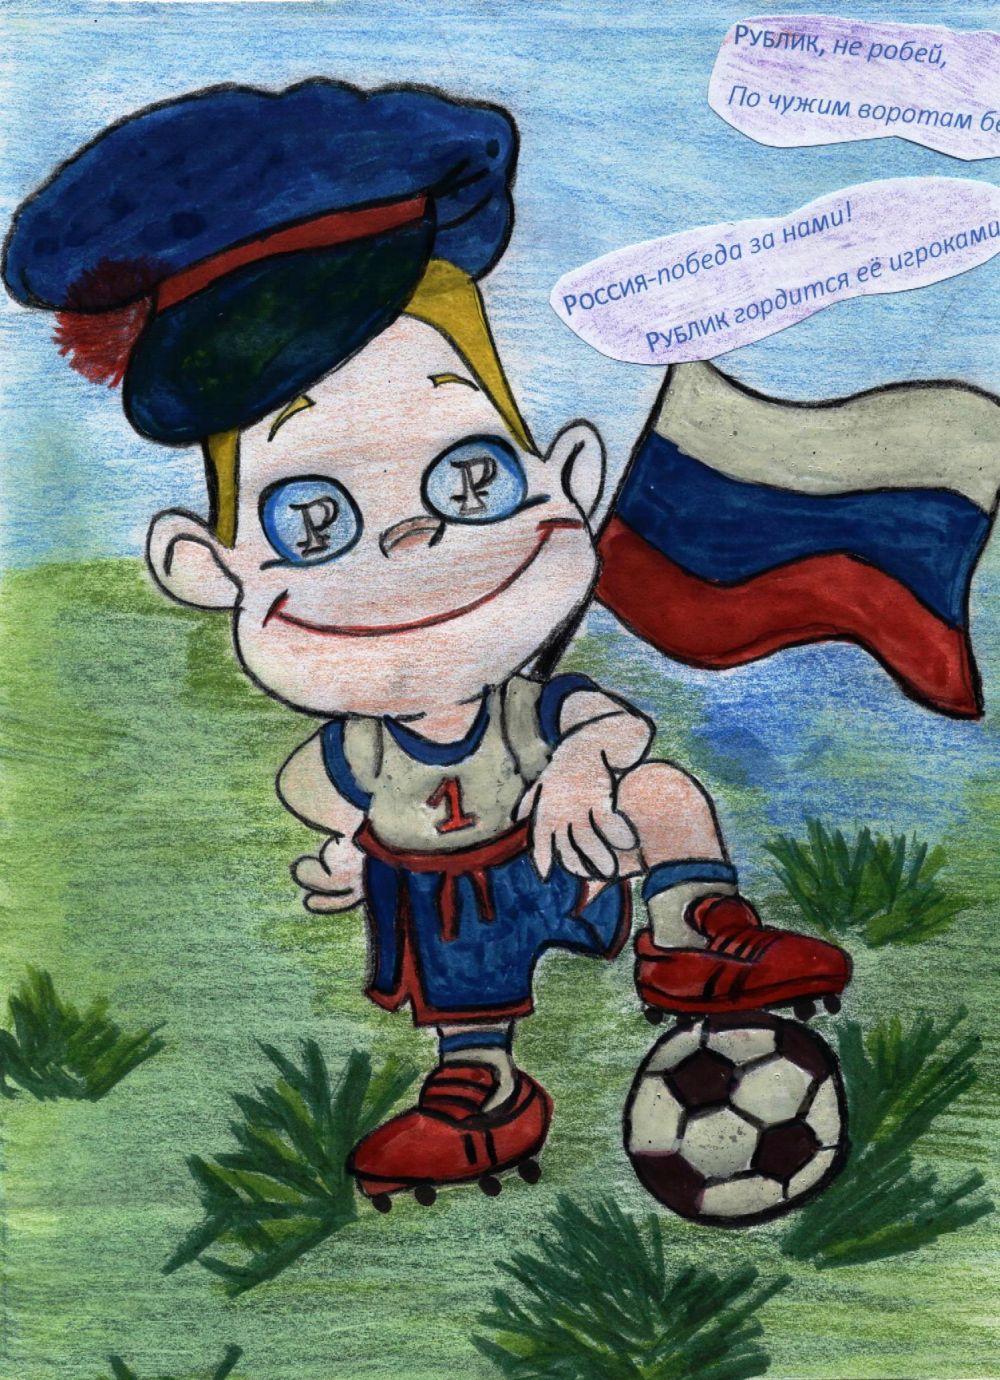 Тицкий Артём, 10 лет, Пятигорск